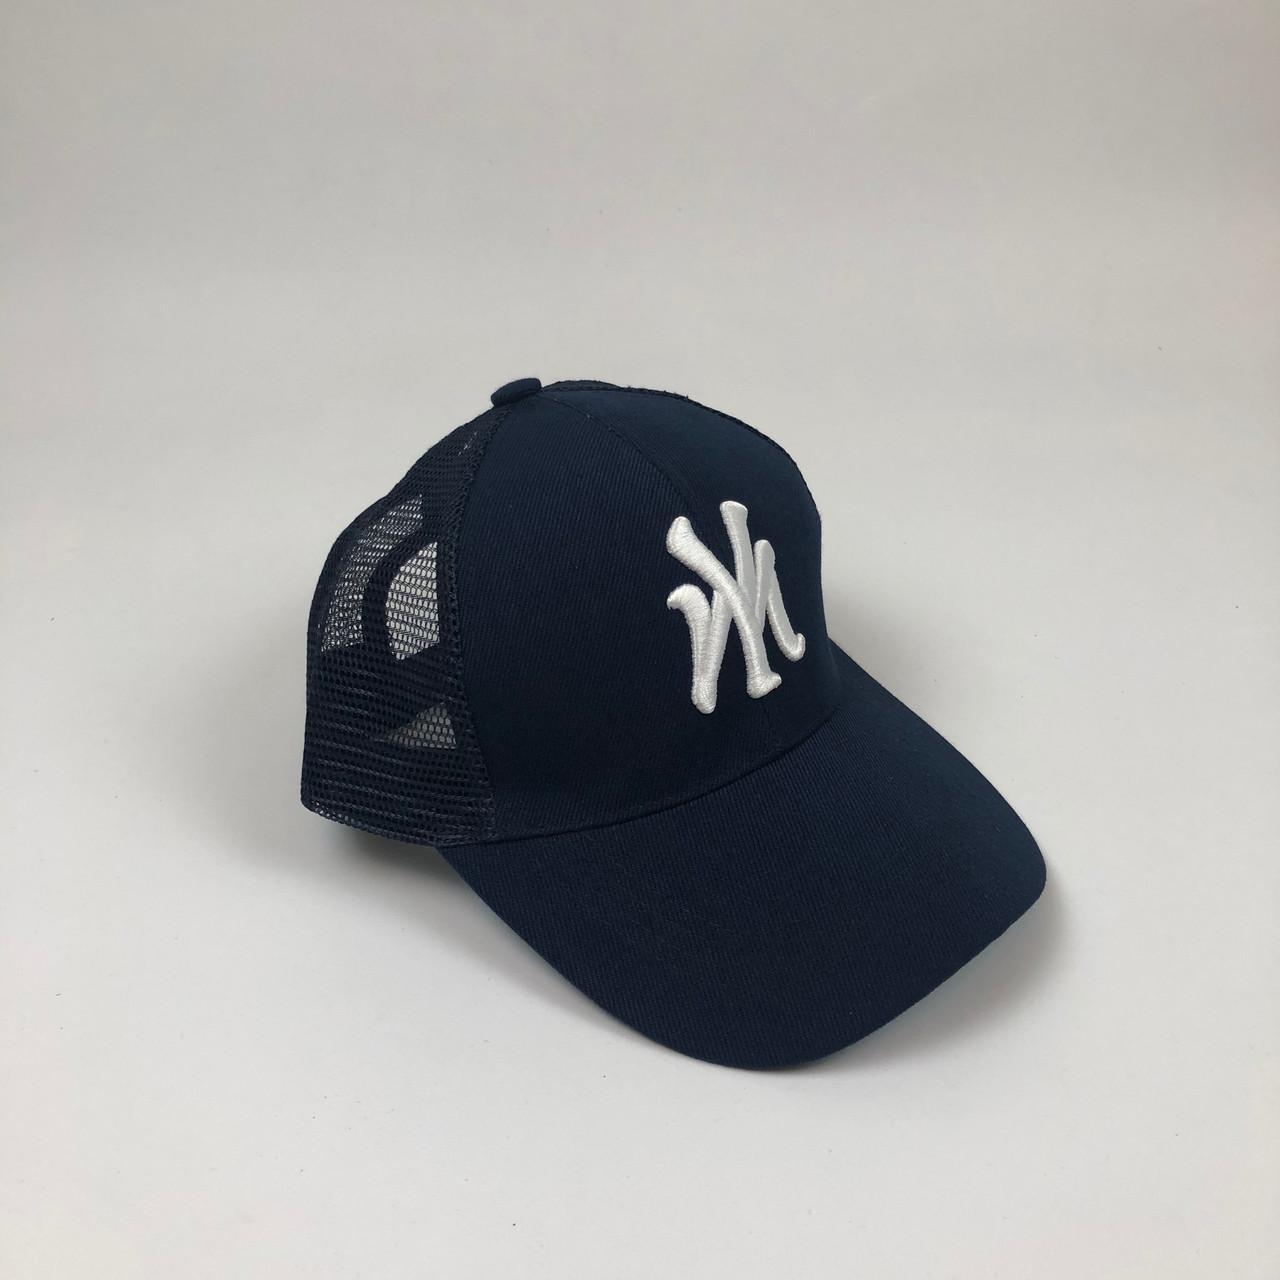 Кепка Бейсболка Тракер с сеткой New York Yankees NY Темно-синяя